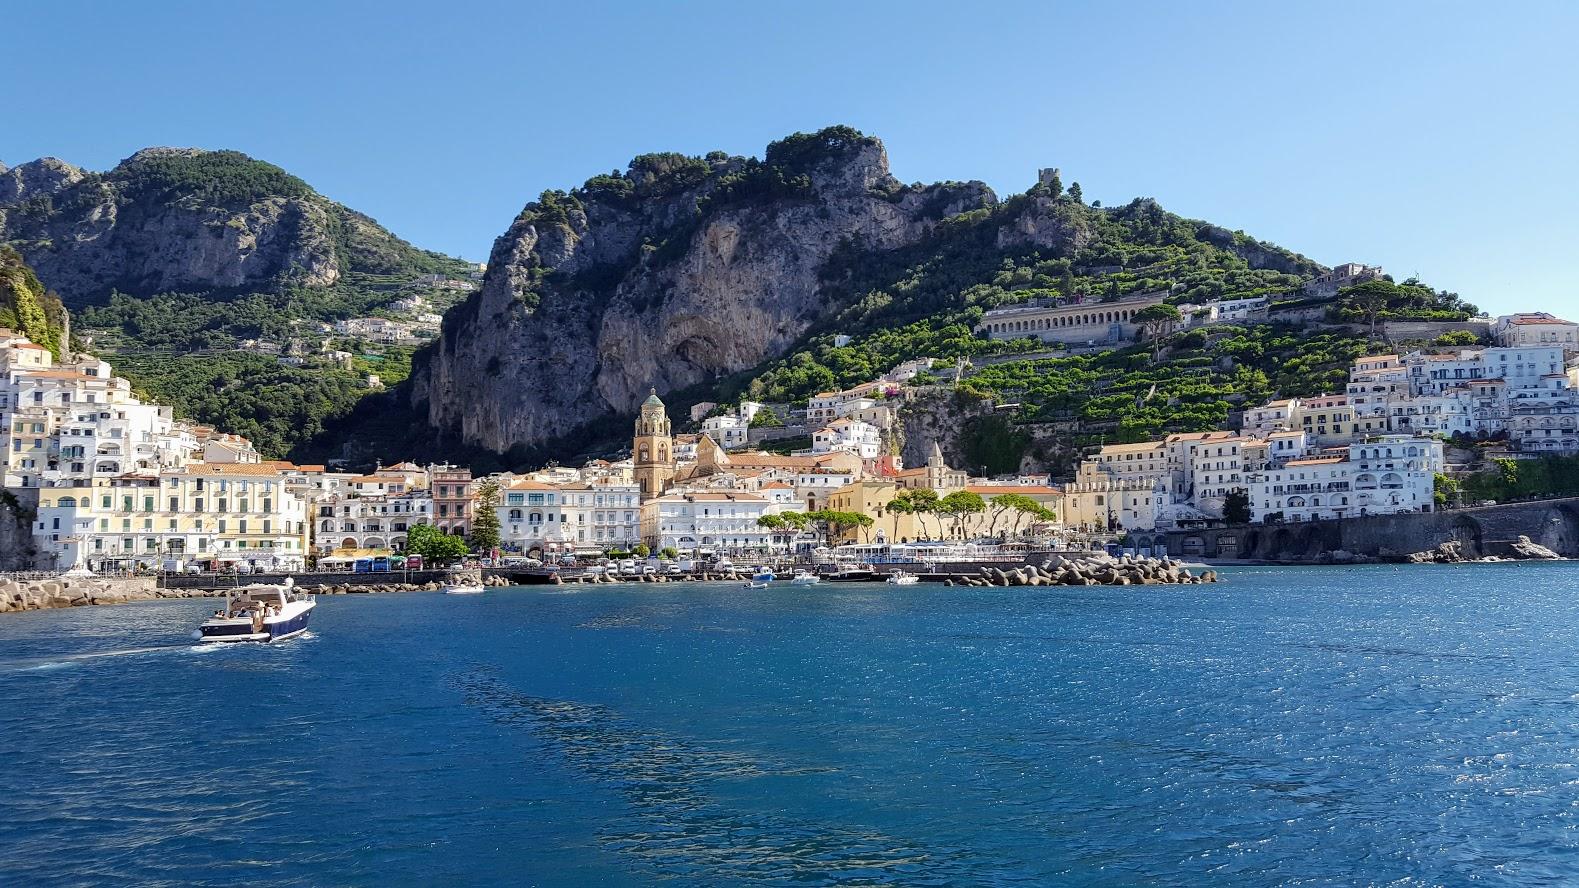 Arriving in Amalfi by Boat